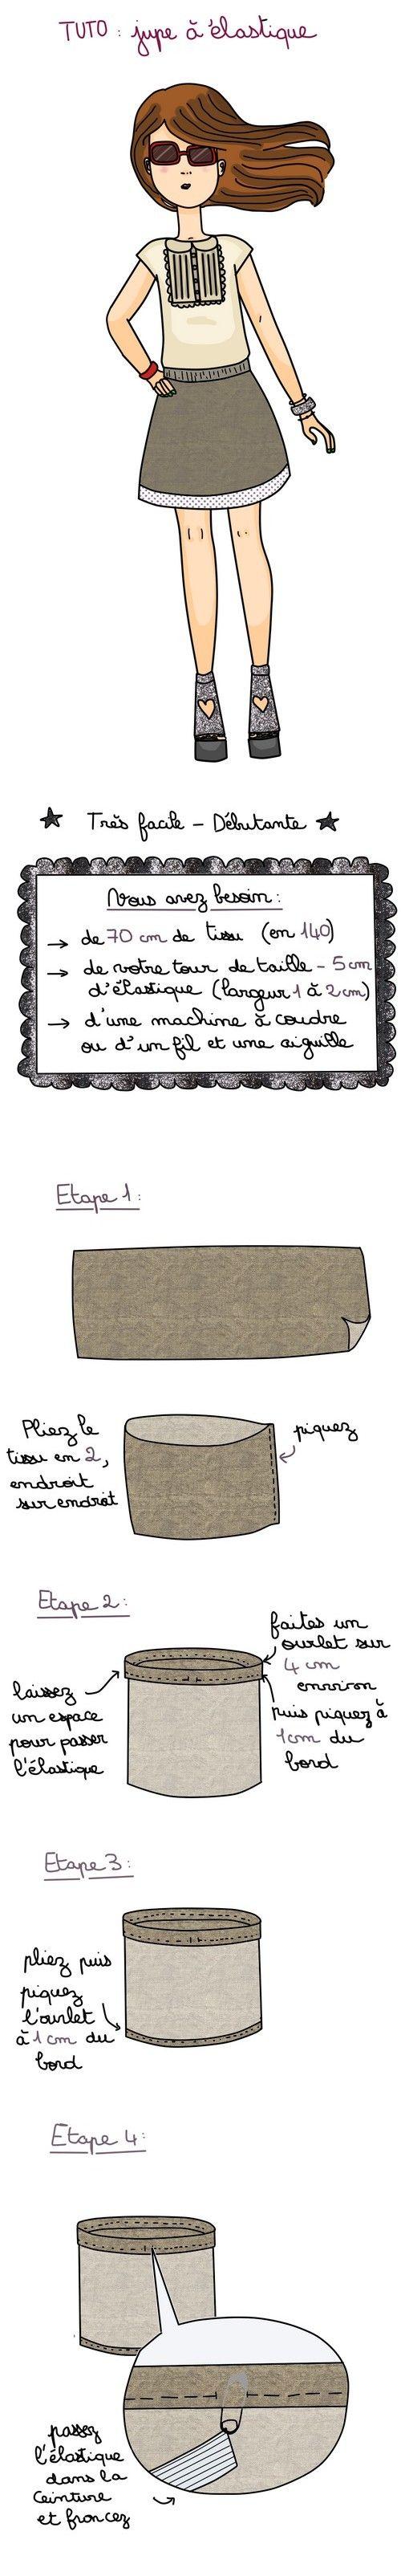 tuto d 39 une jupe facile des id es par milliers tutorials comic and easy. Black Bedroom Furniture Sets. Home Design Ideas